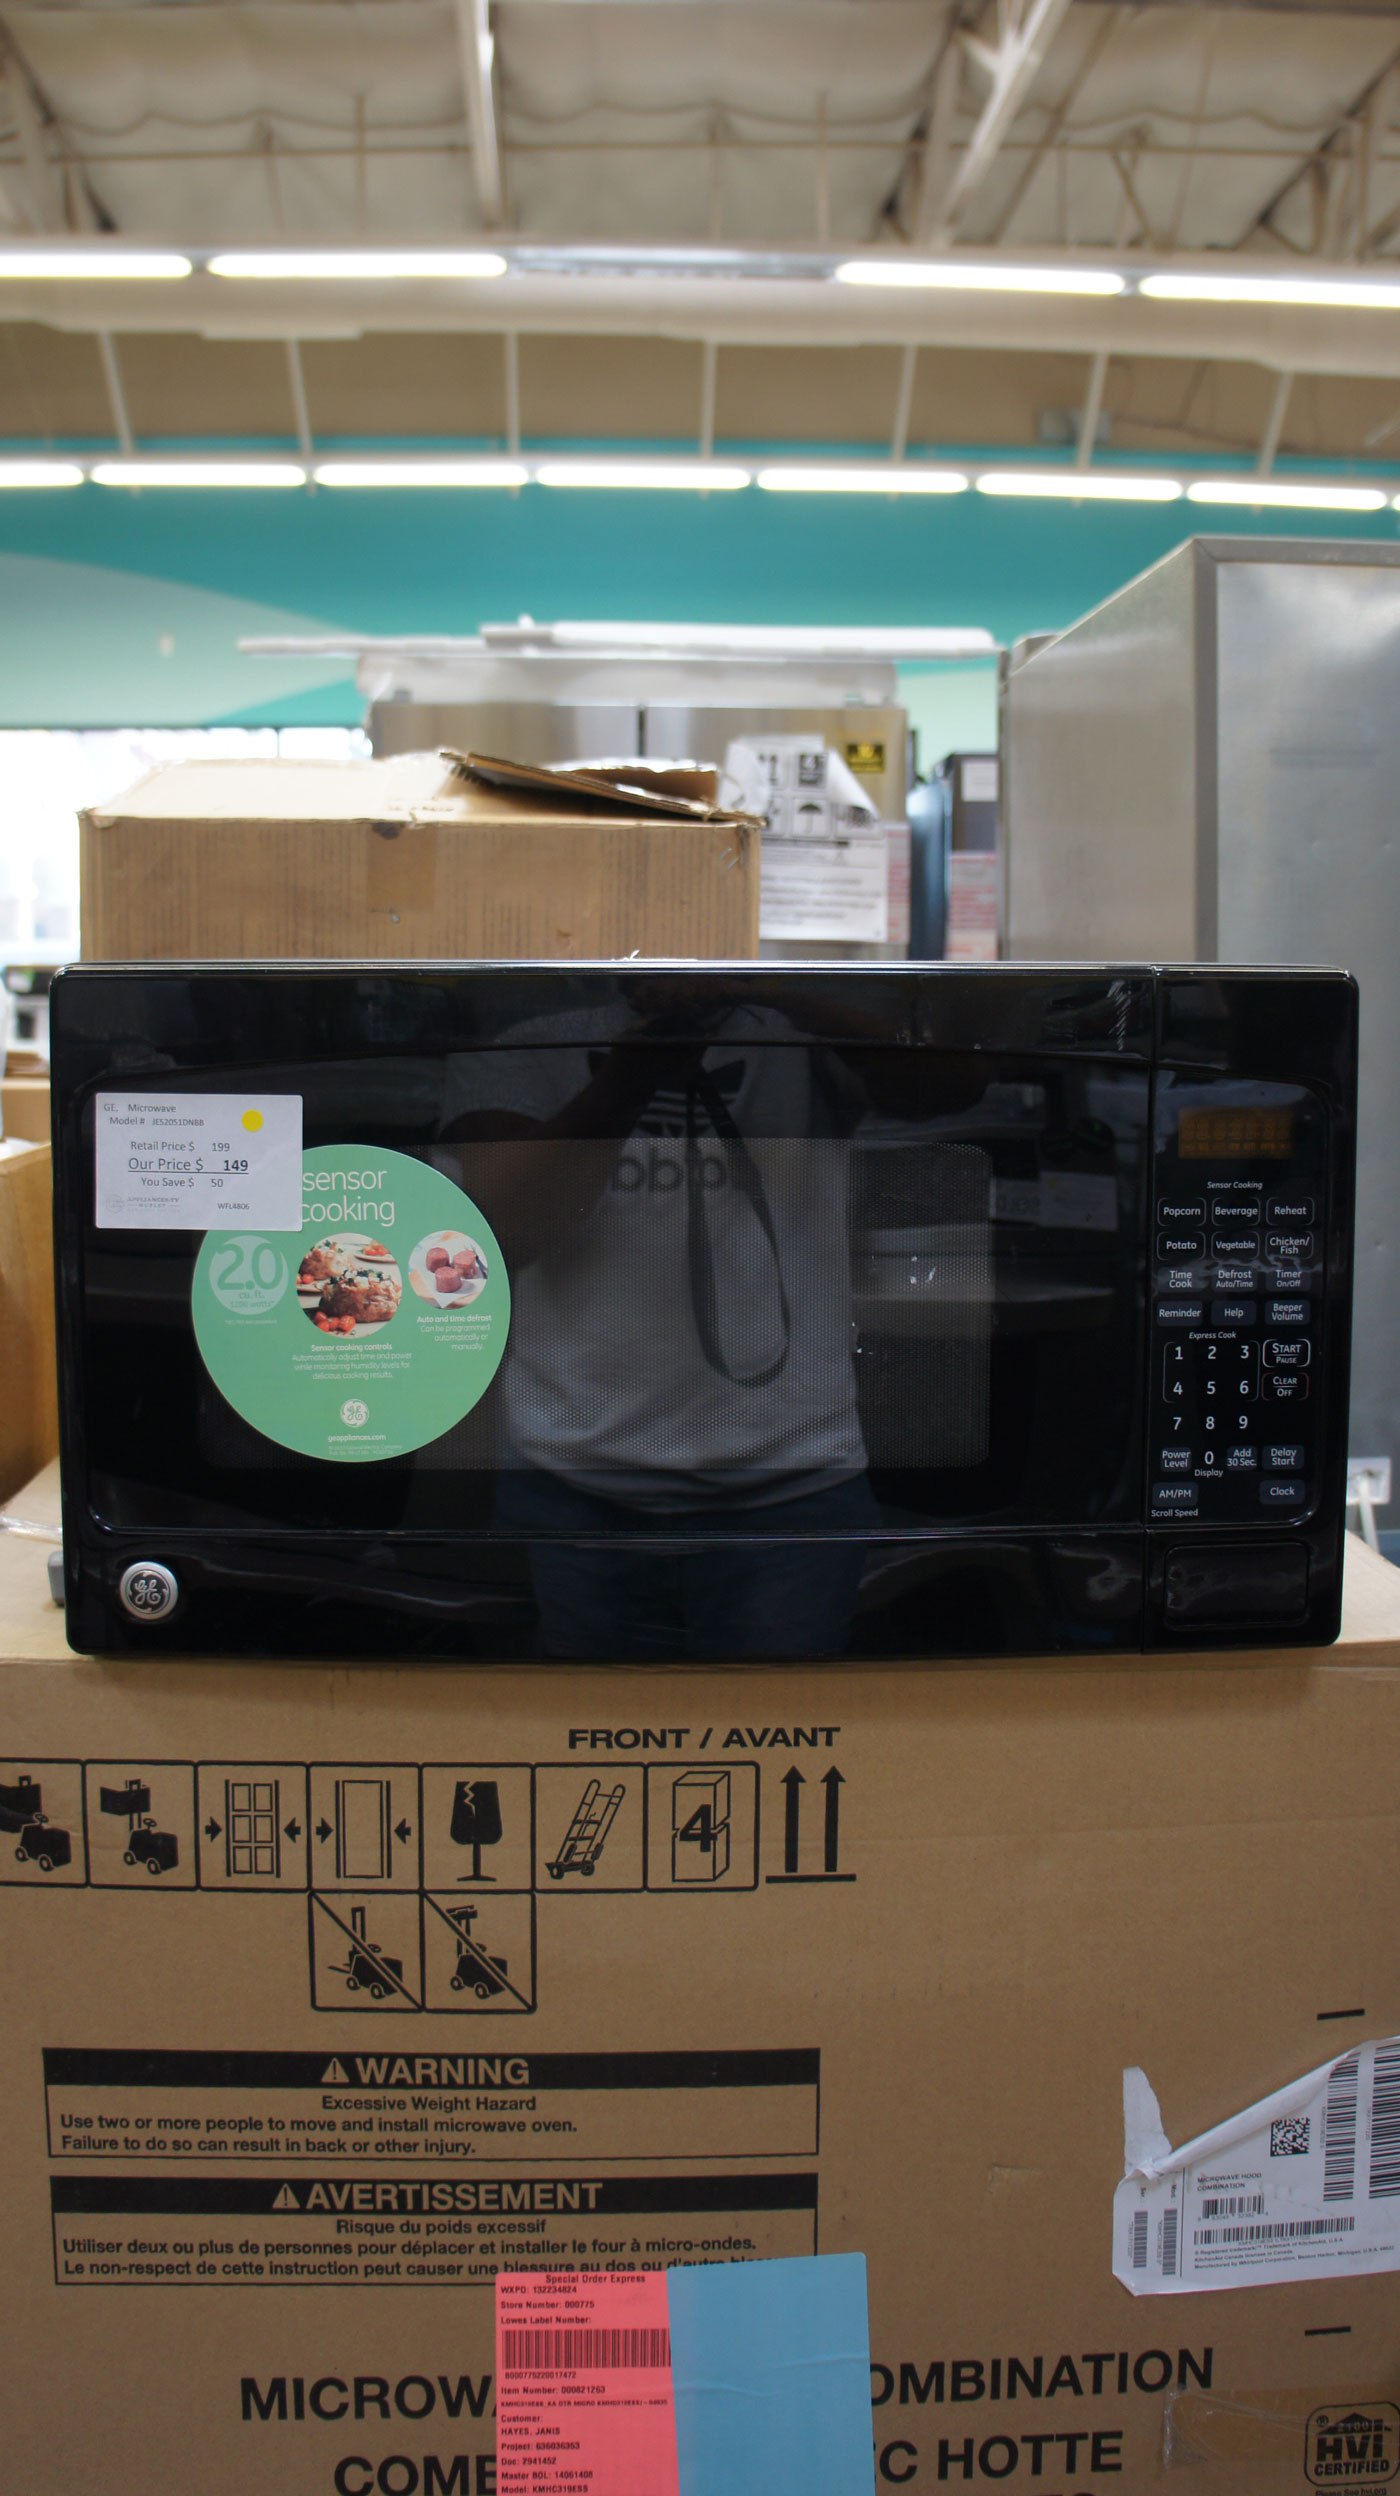 GE JES2051DNBB 1200 Watts Countertop Microwave Oven